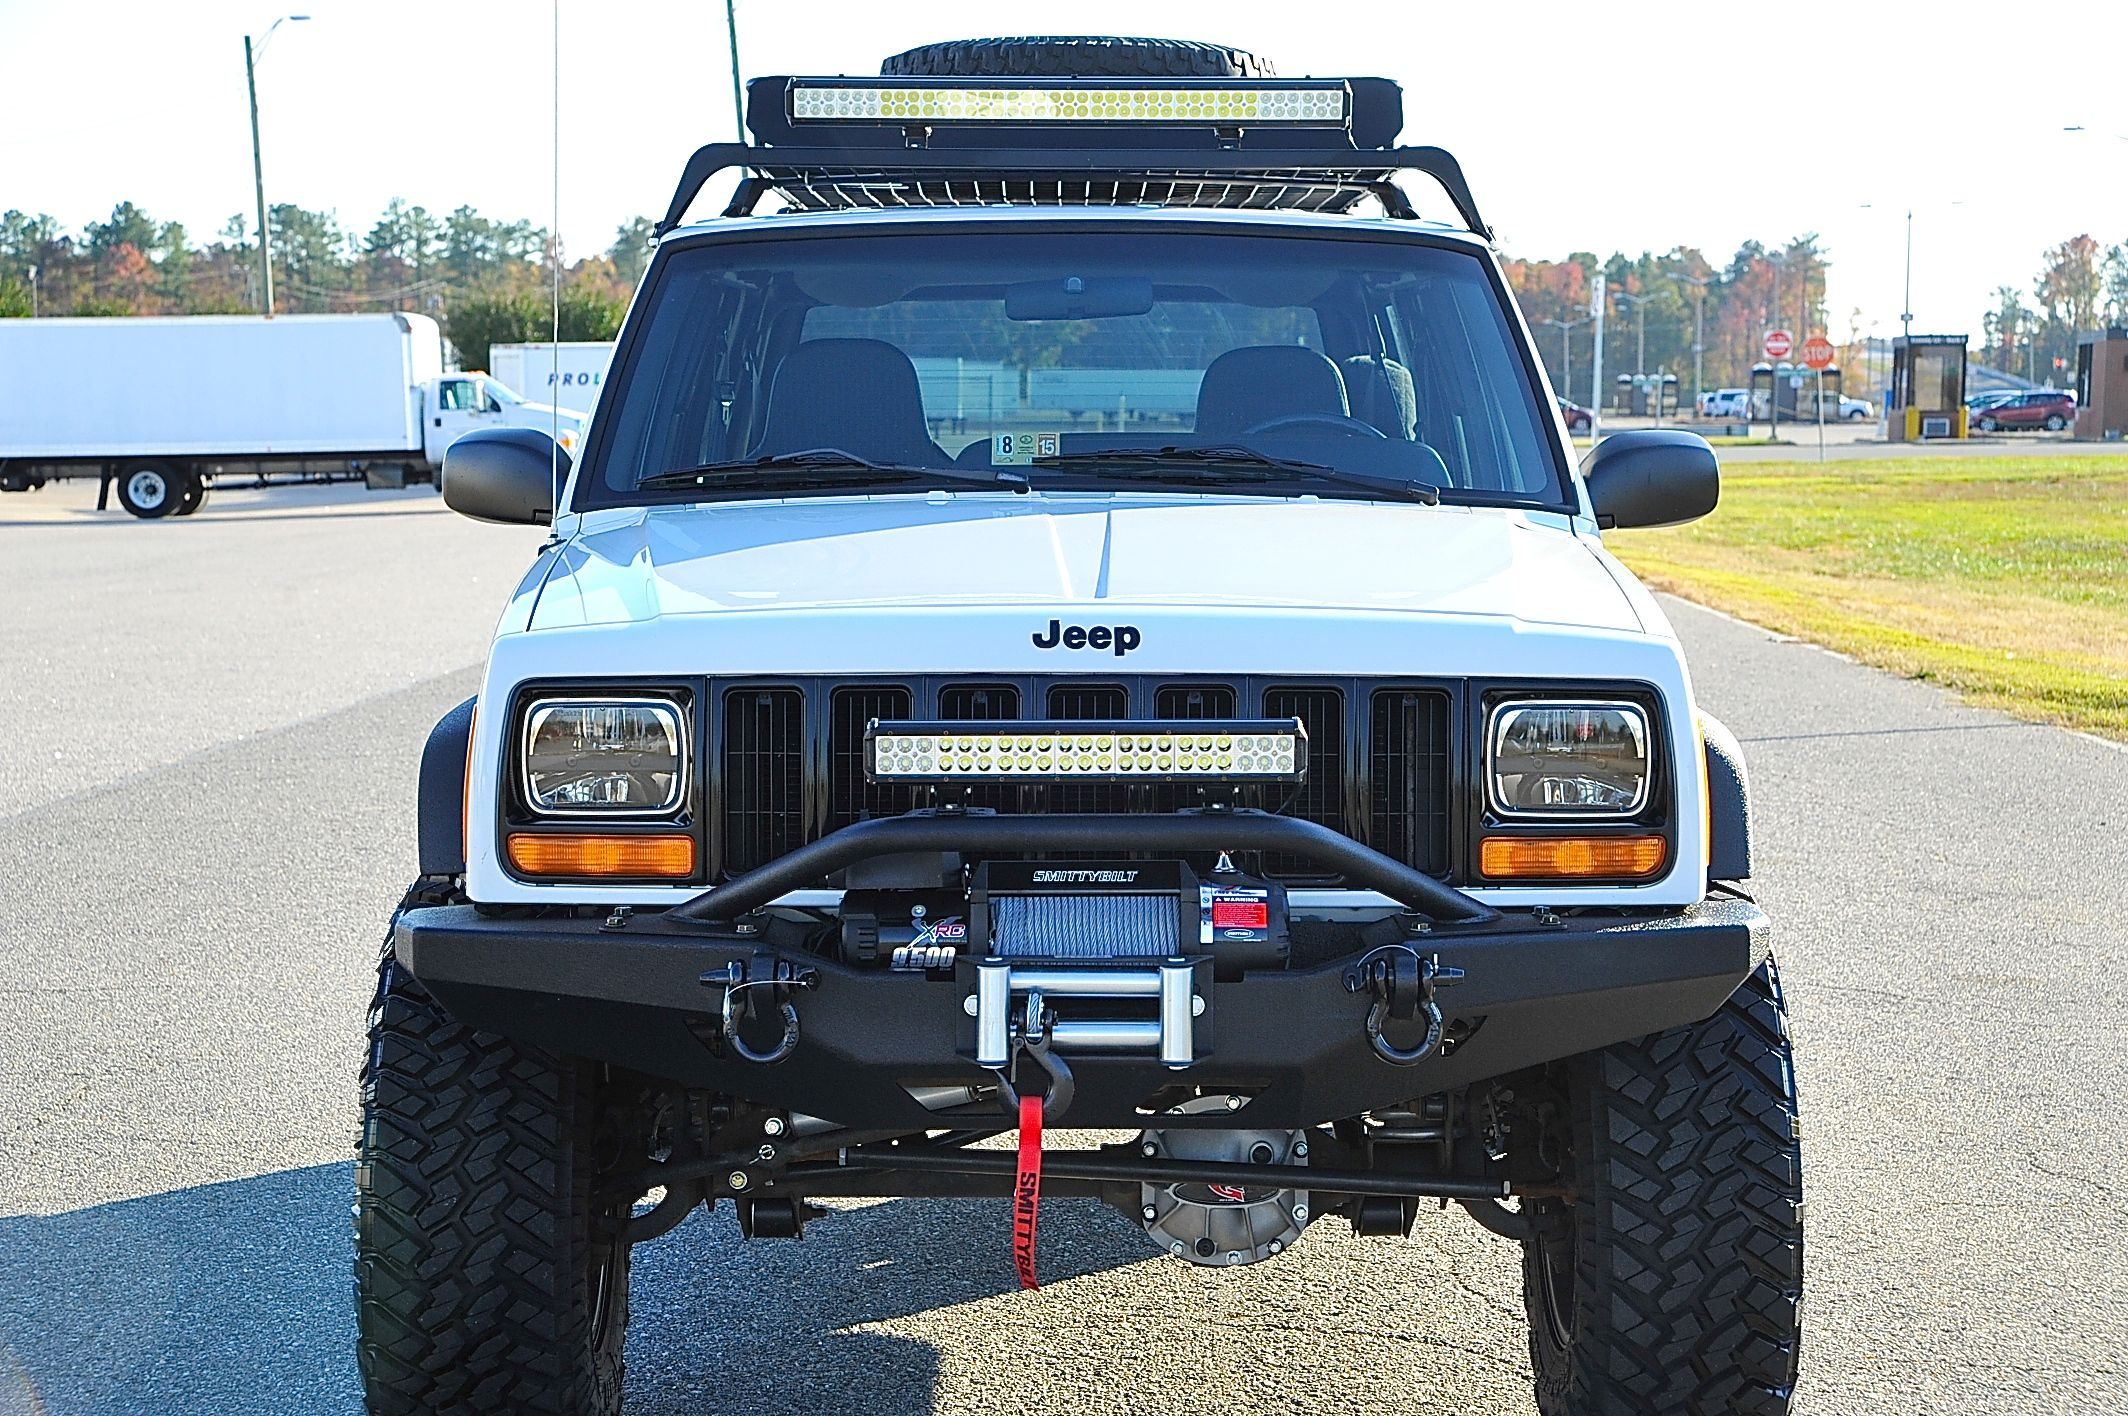 light bar jeep cherokee xj - Google Search